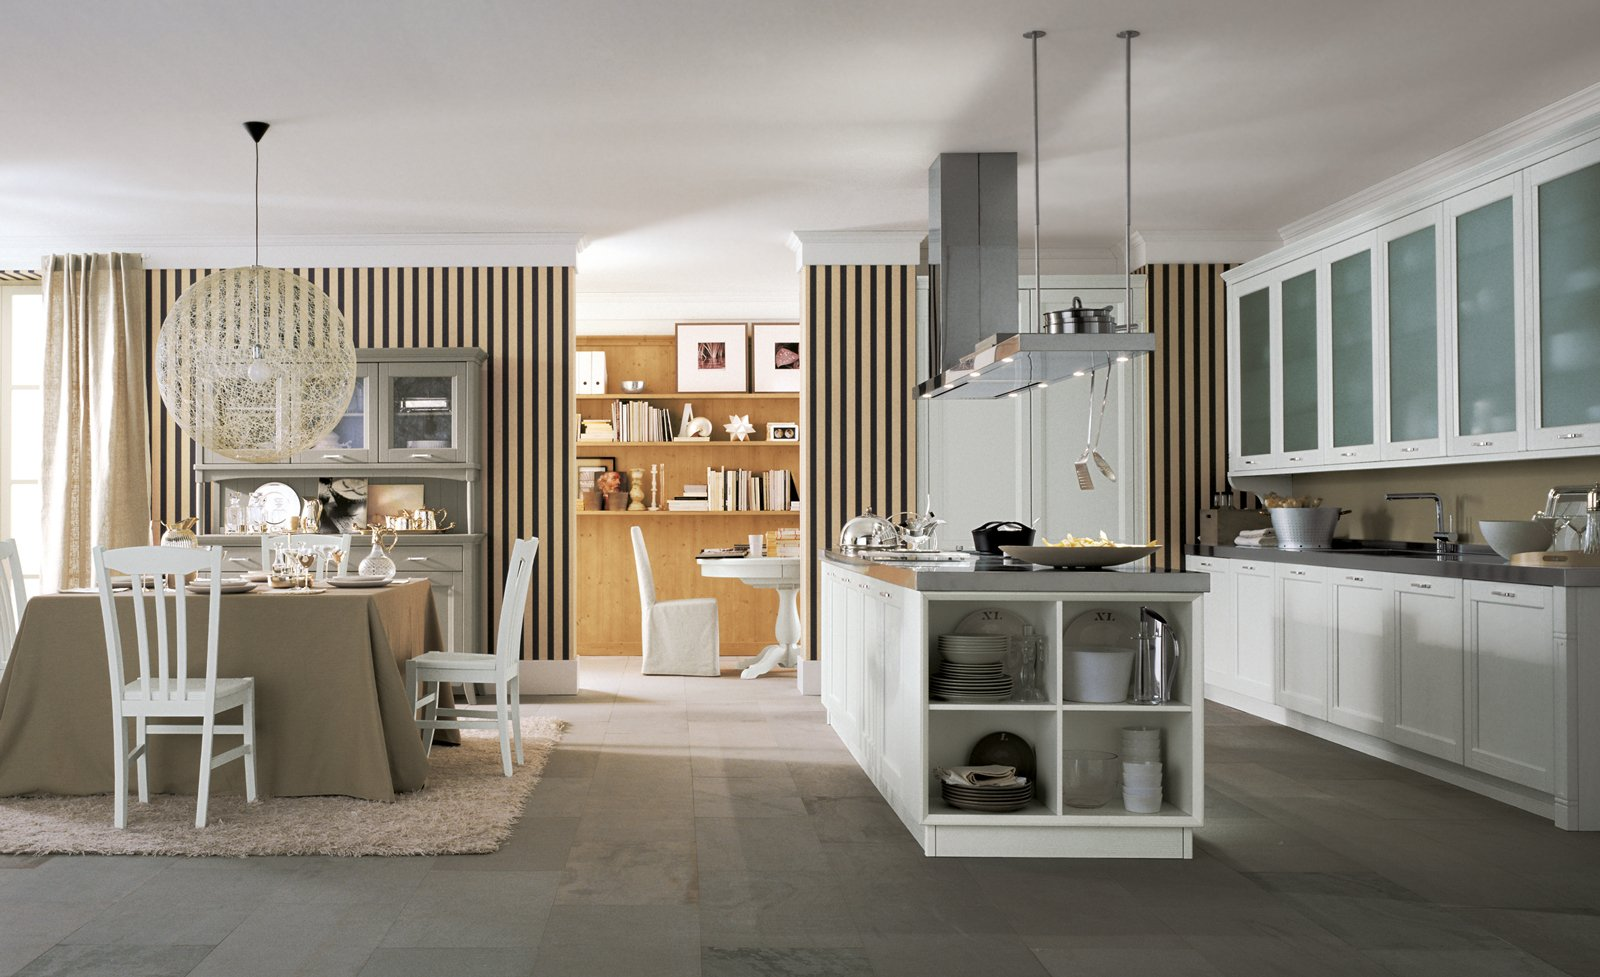 Banconi Per Cucina Images - Acomo.us - acomo.us